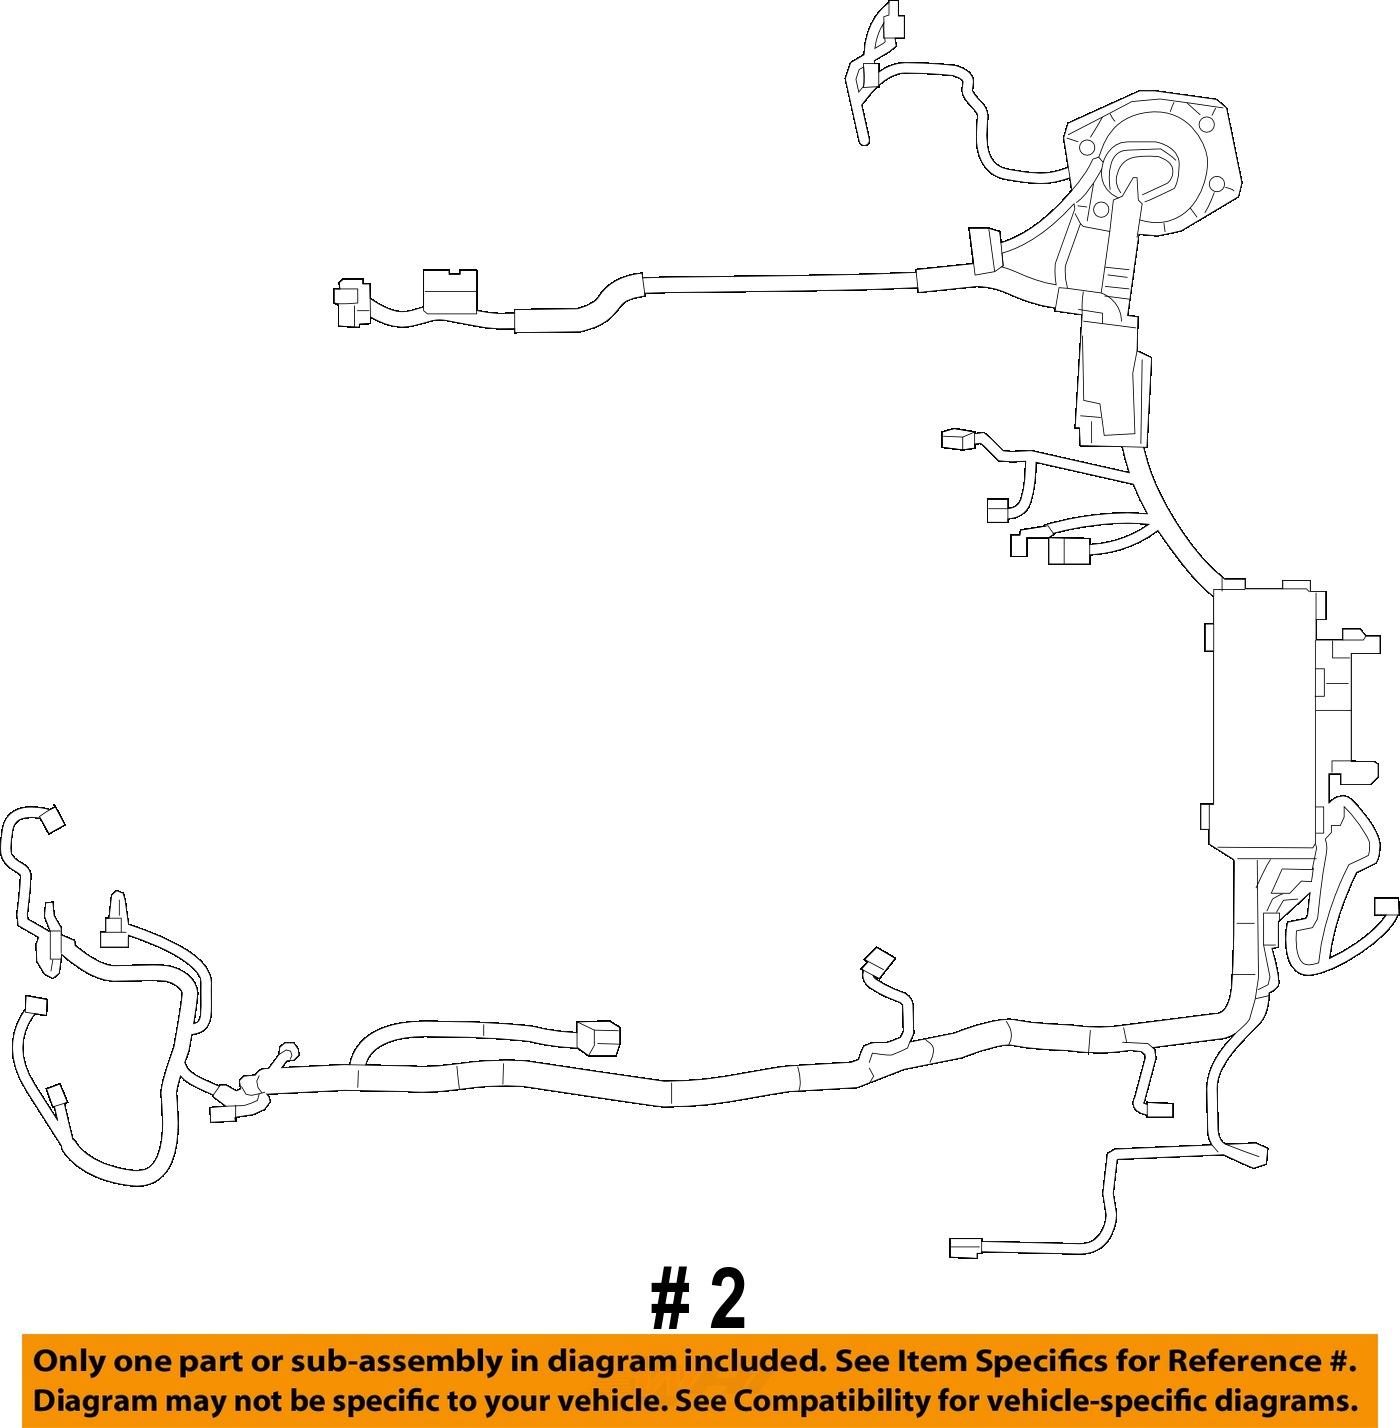 metra 70 1761 wiring diagram scosche line out converter 06 scion tc stereo dodge stratus